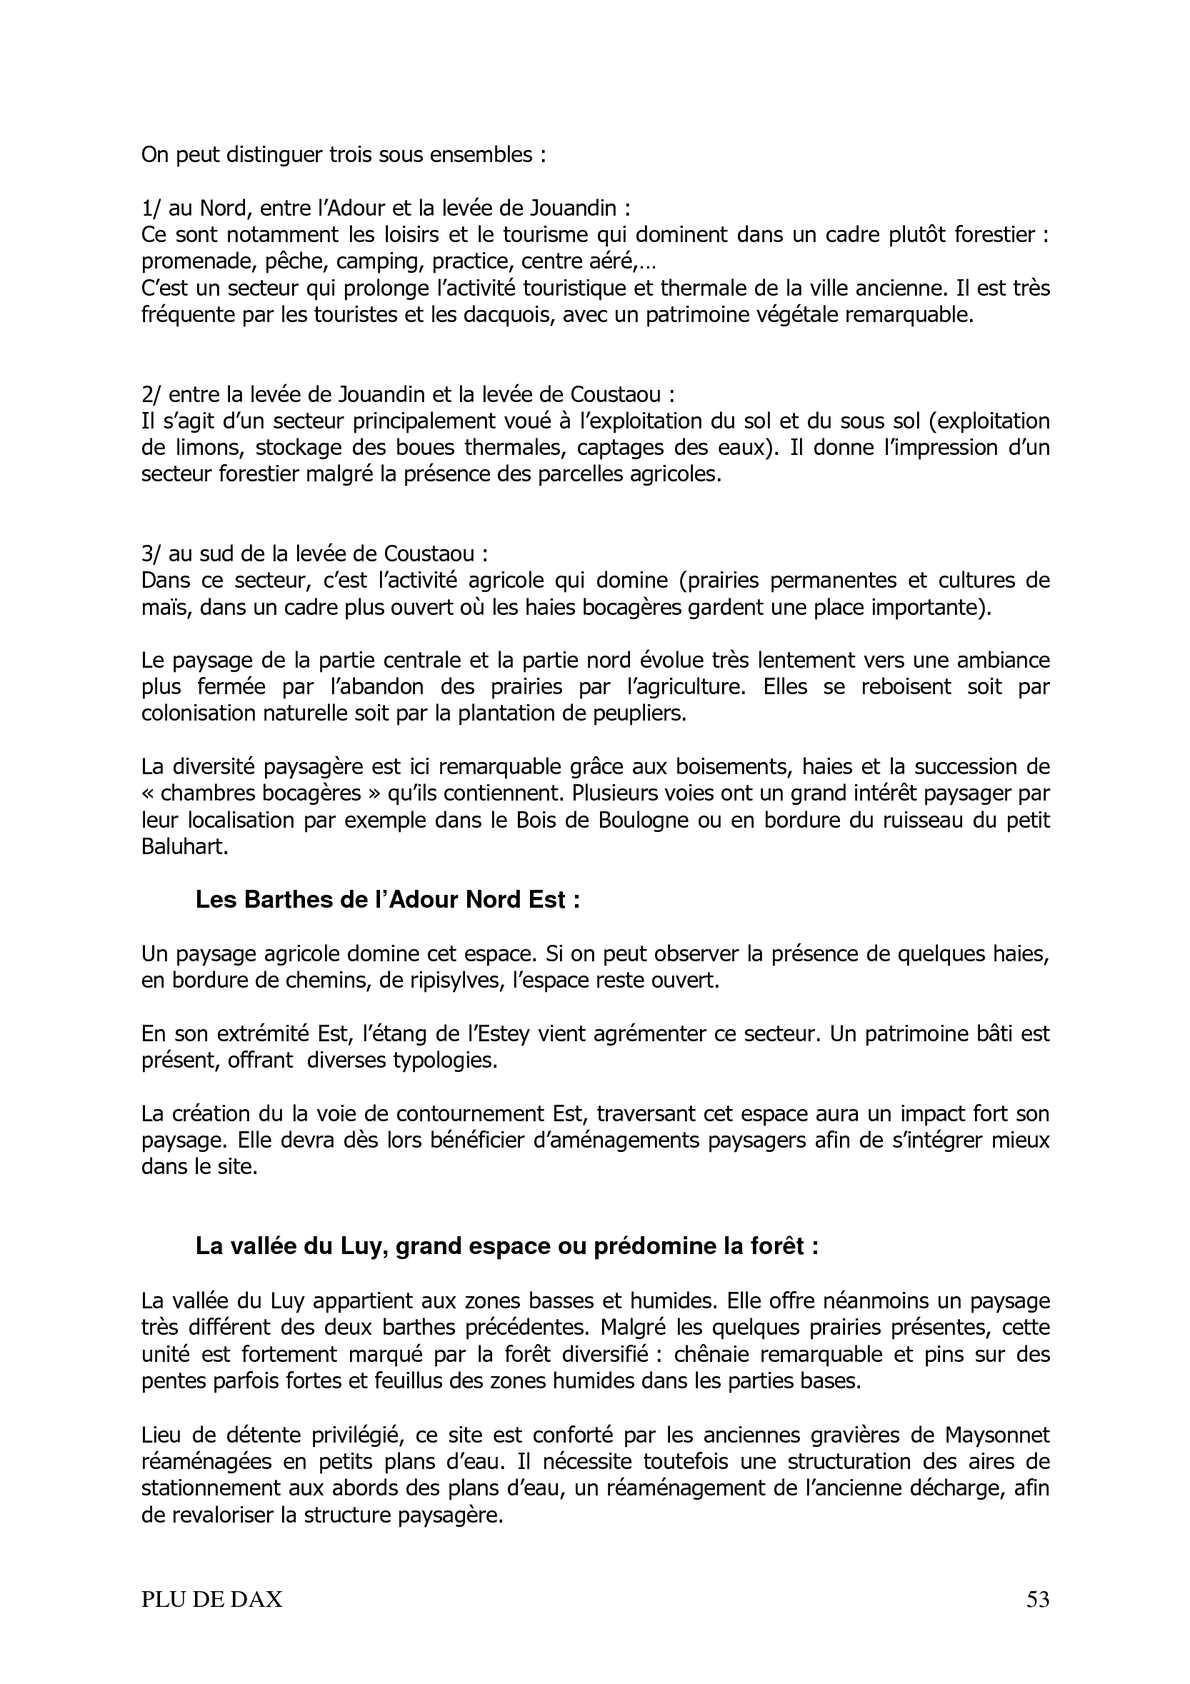 Présentation Du Plu De Dax Calameo Downloader